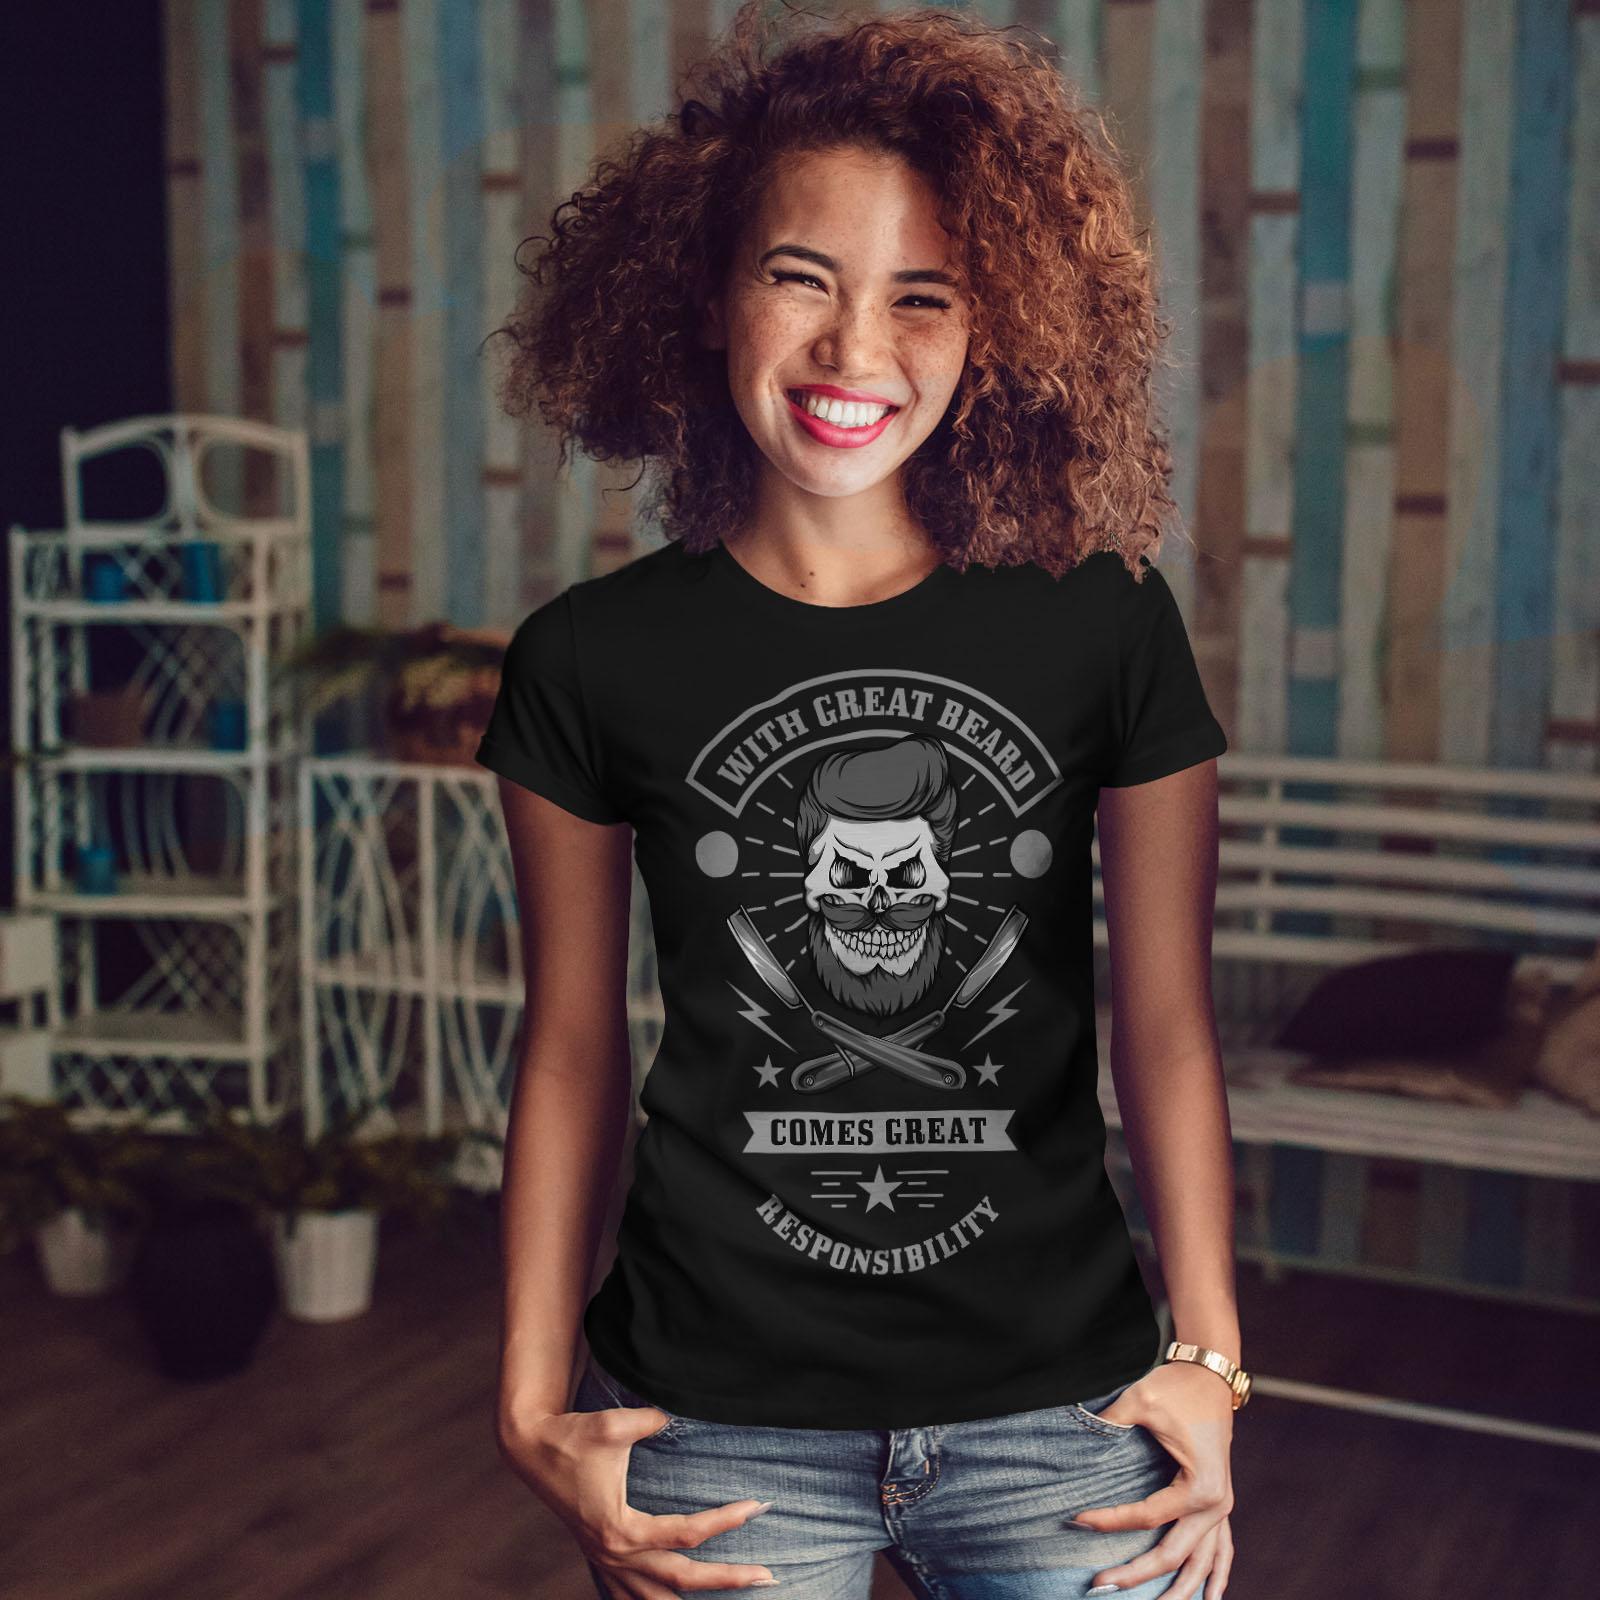 miniature 4 - Wellcoda Great Beard Style Funny Womens T-shirt,  Casual Design Printed Tee